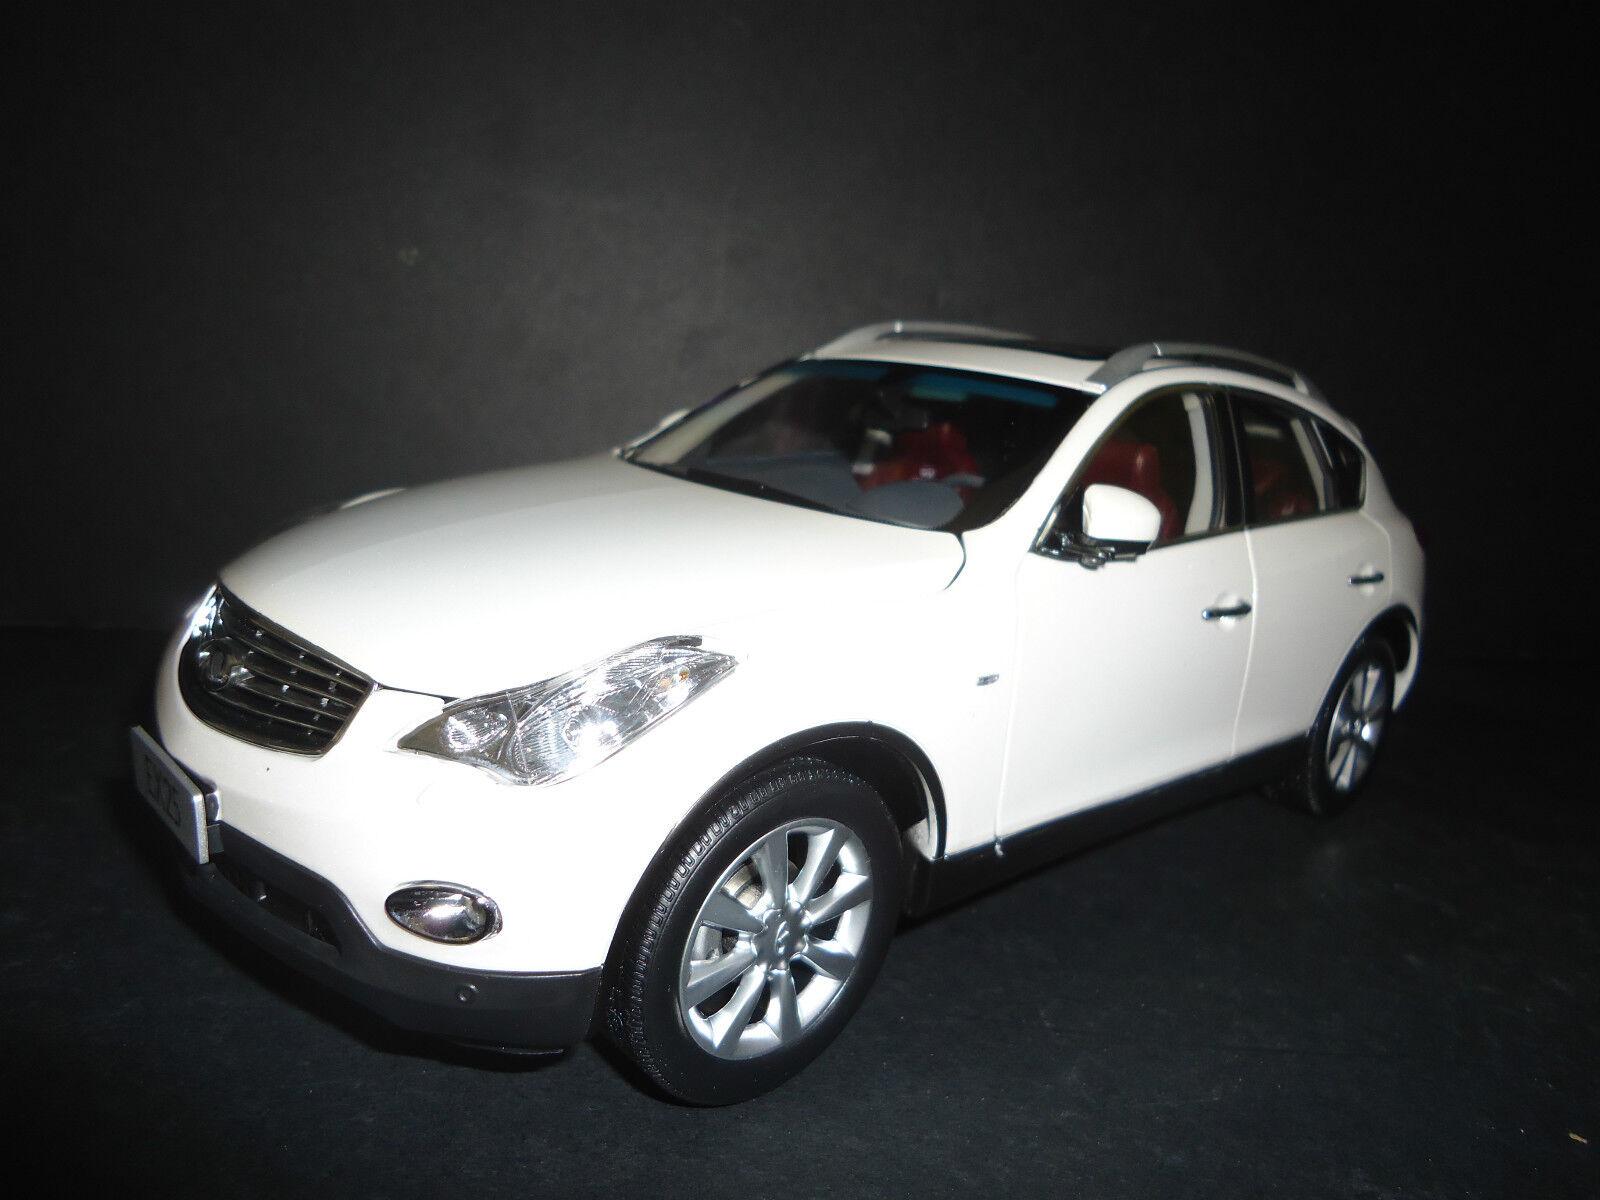 Paudi Infiniti EX25 2012 white 1 18 Hochwertig Modell